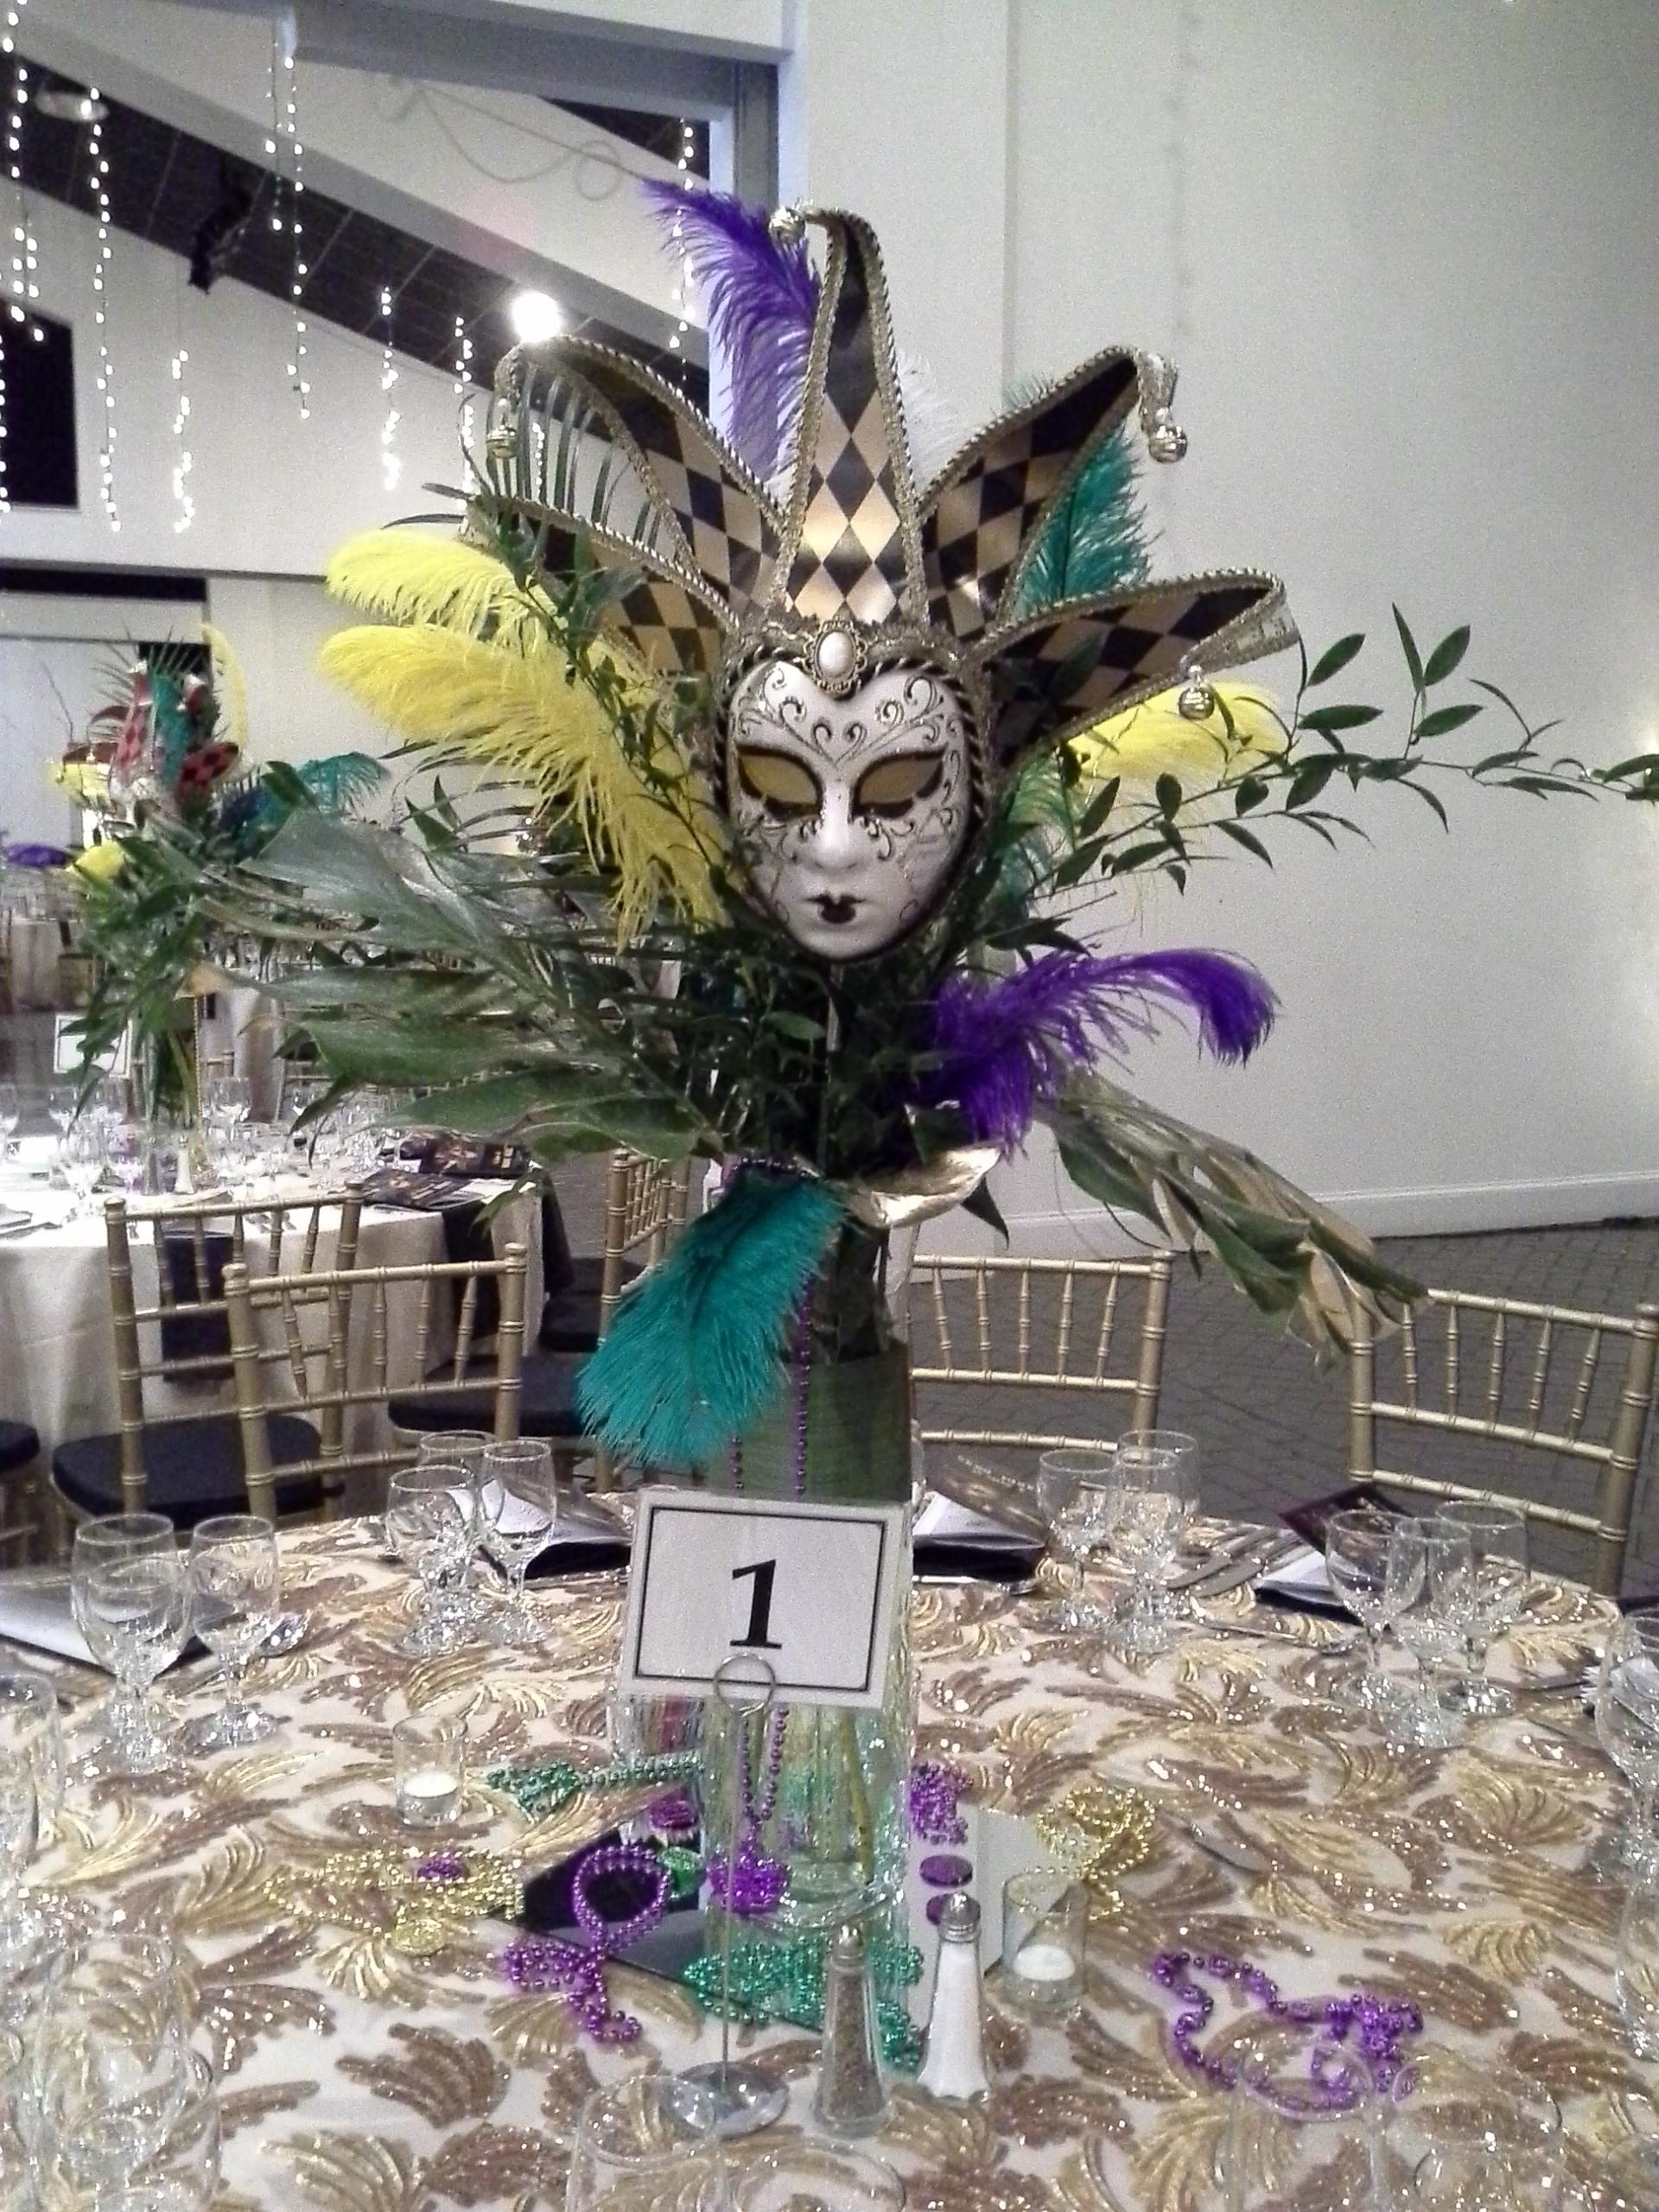 adding  u201ca taste of mardi gras u201d decorations to our charity ball